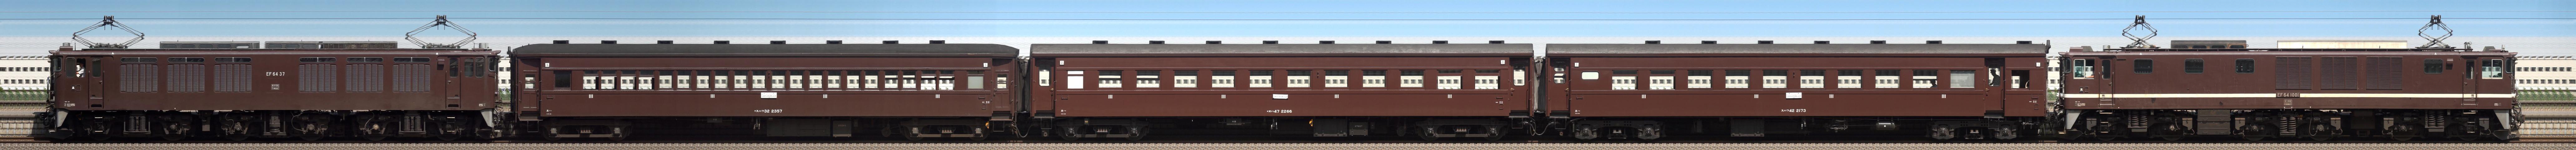 2016-07-23-EF64-37 旧客3B EF64-1001 列車サイドビュー